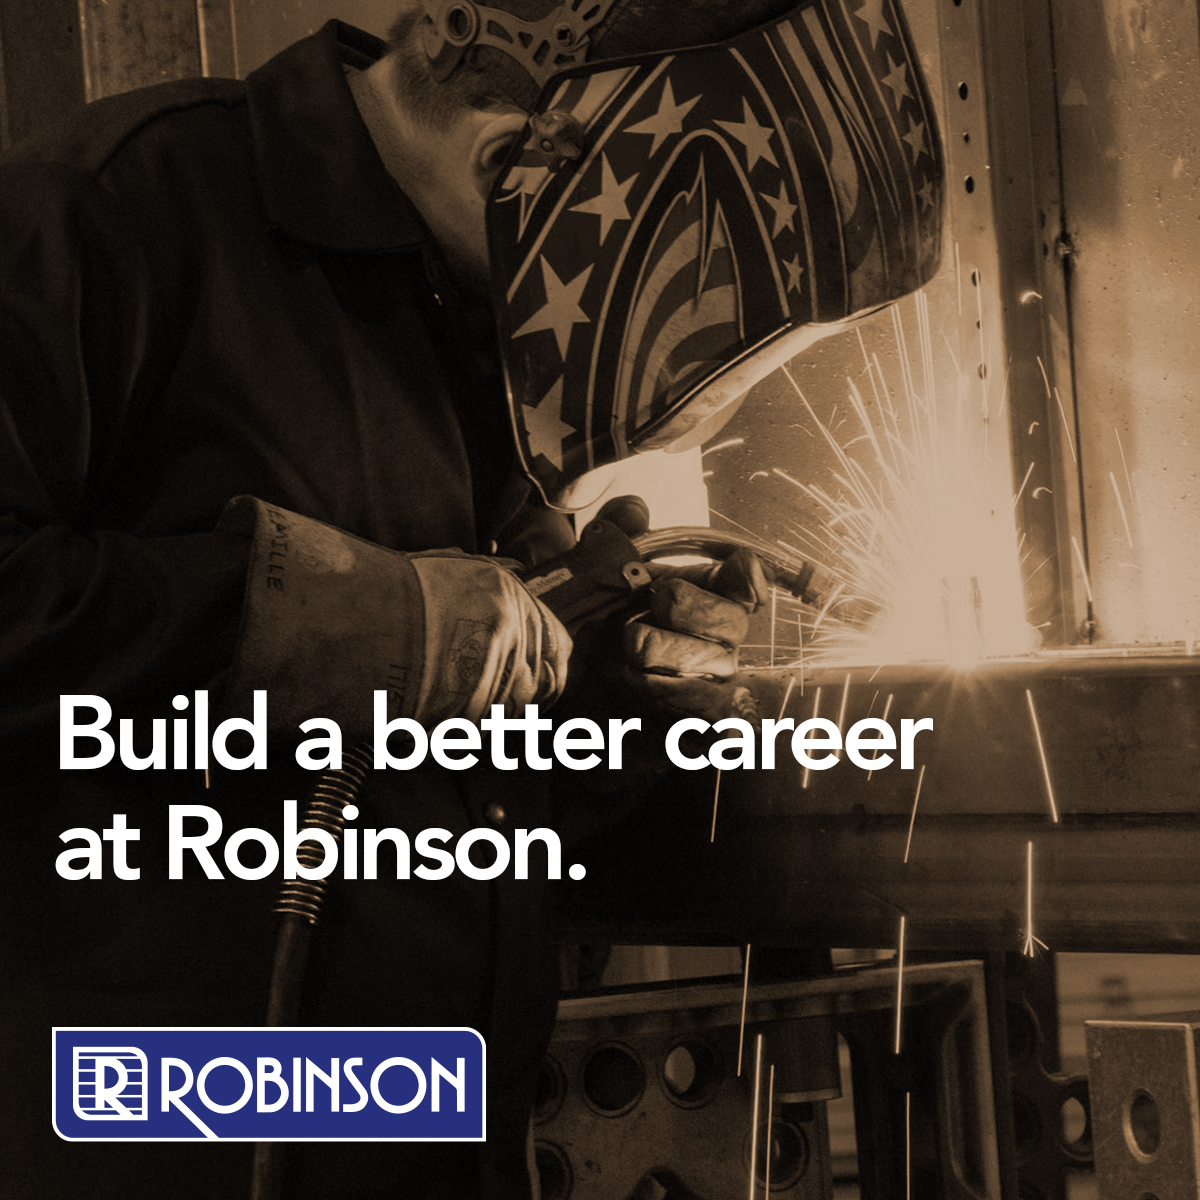 Change-Robinson-Recruitment-2021-BetterCareer